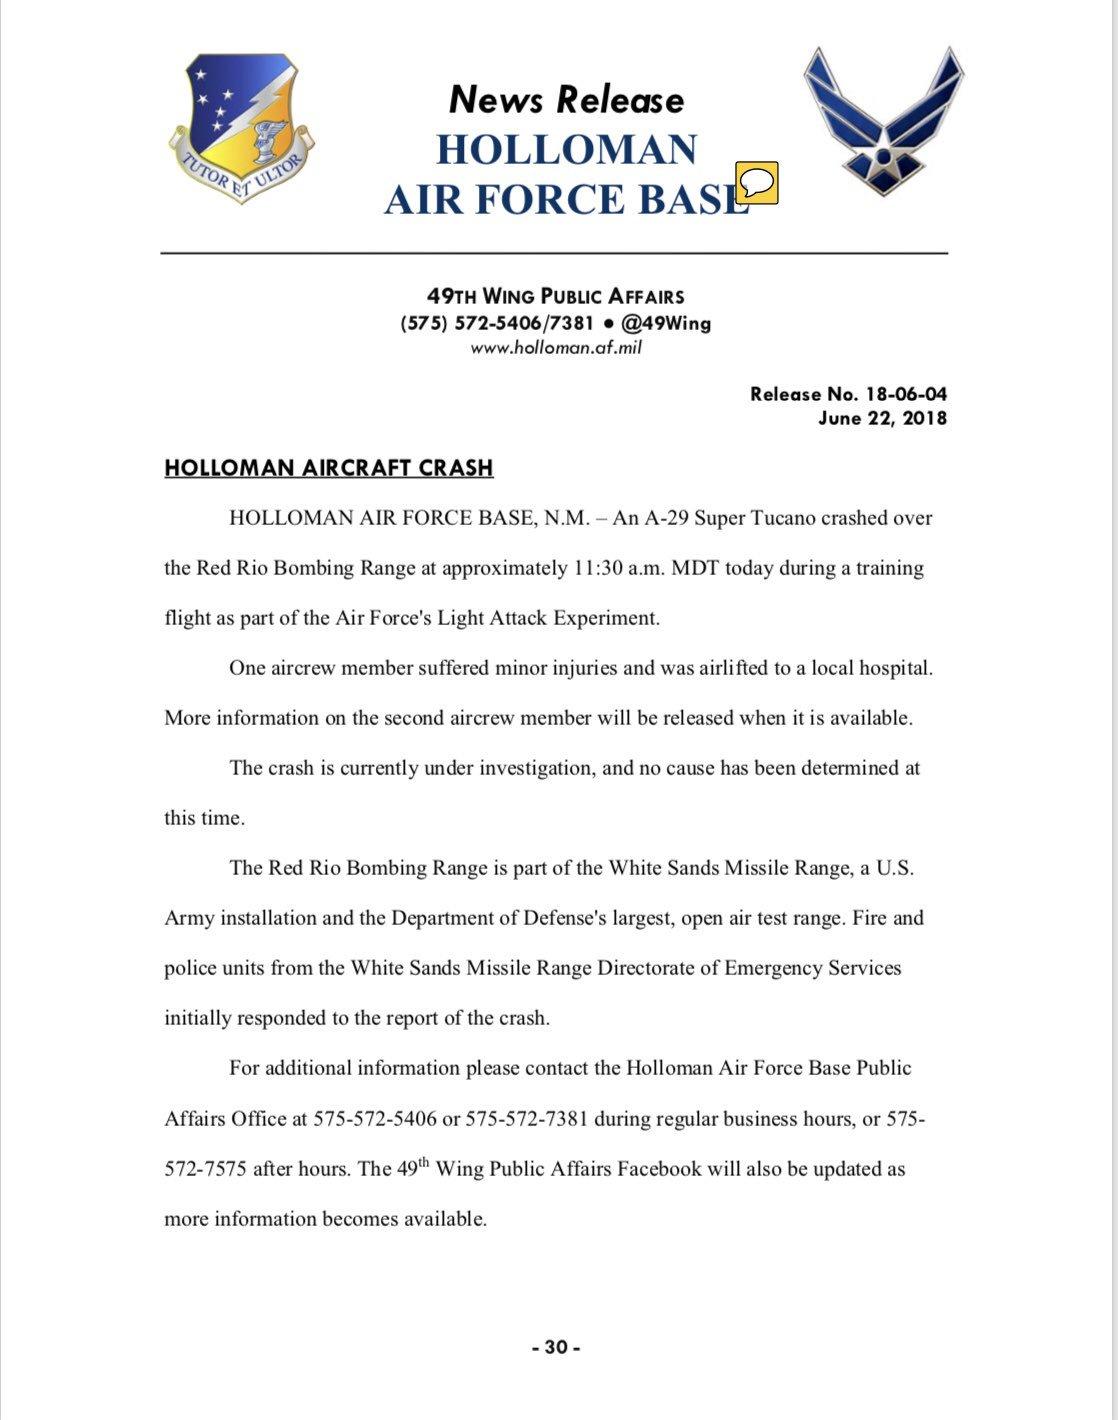 A-29 Super Tucano Crashed near Holloman Air Force Base